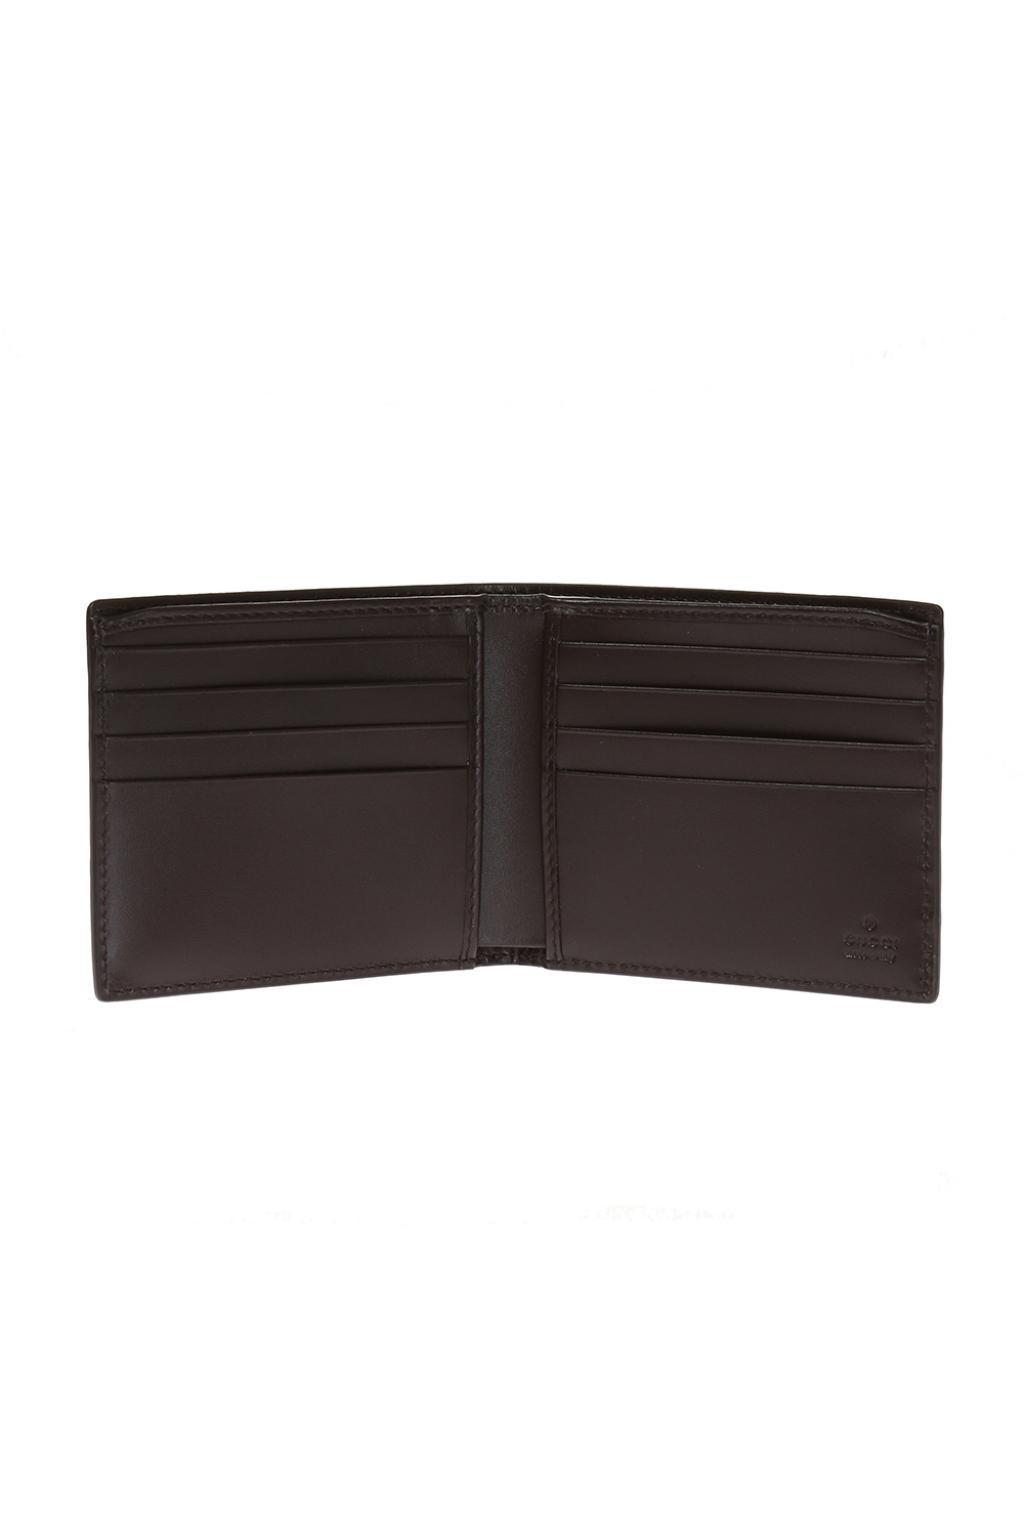 278807af4123 Gucci - Brown Leather Bi-fold Wallet for Men - Lyst. View fullscreen